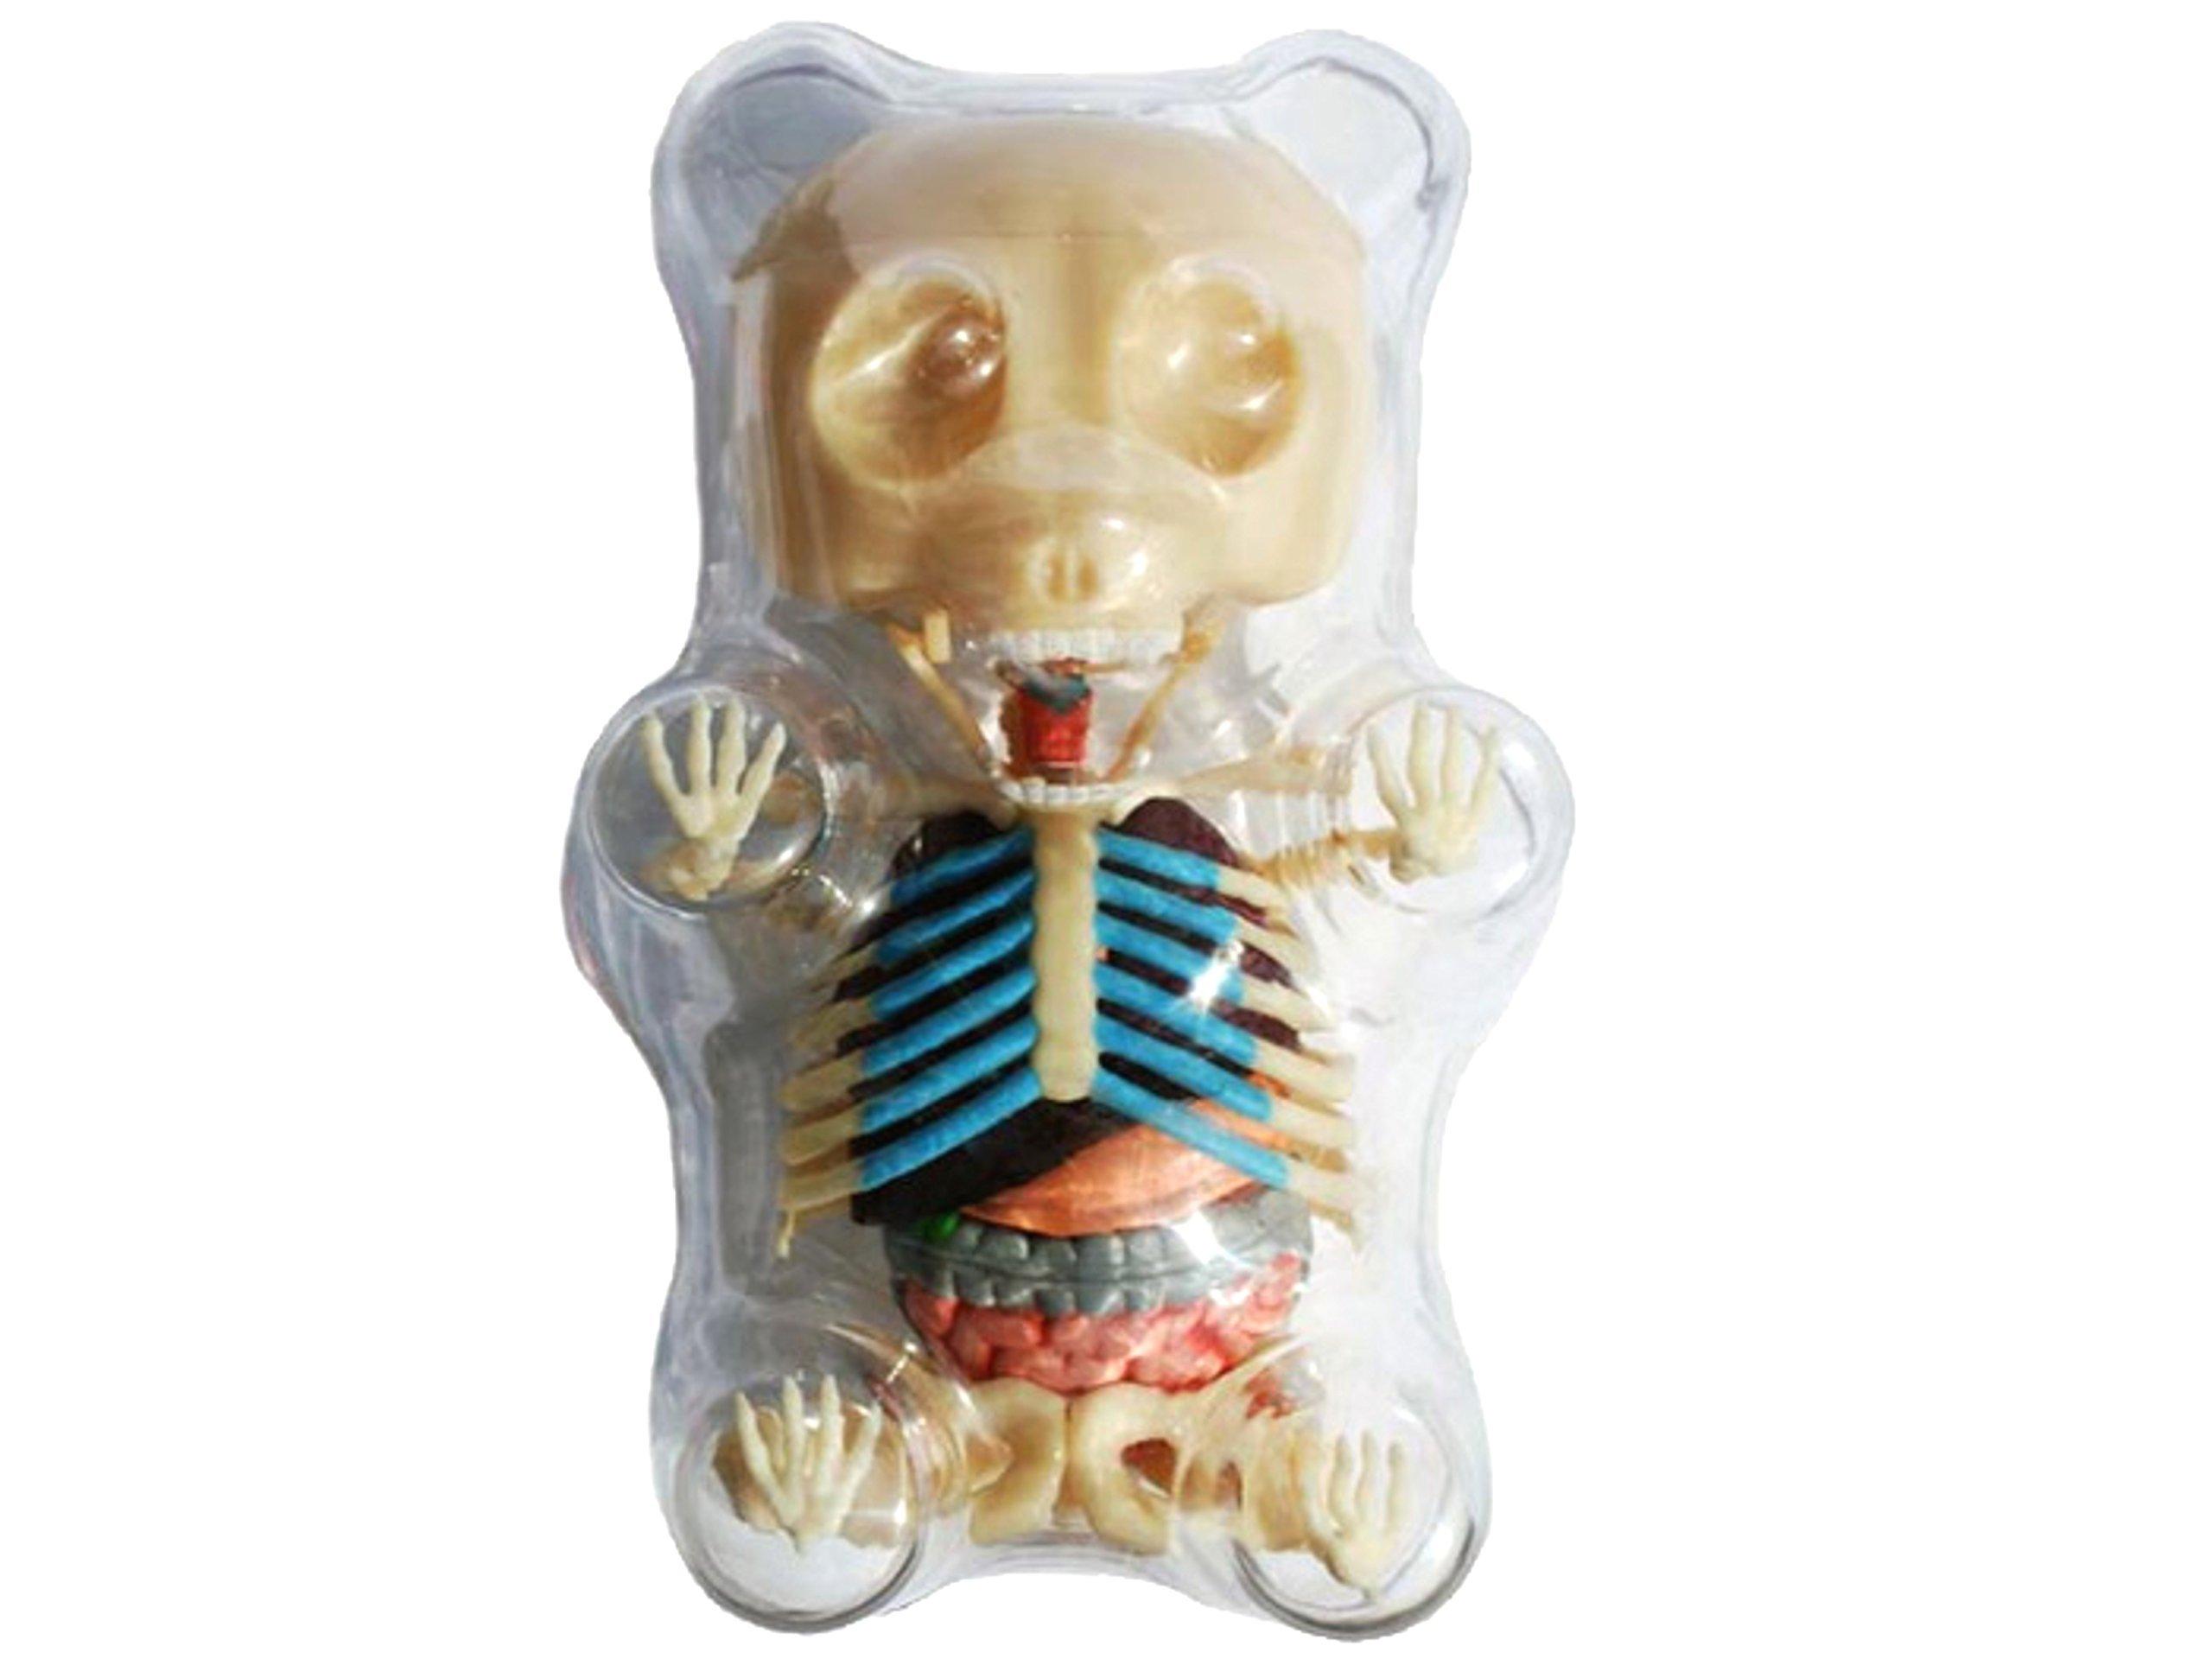 Amazon.com: 4D Master Gummi Bear Skeleton Anatomy Model Kit, Clear ...